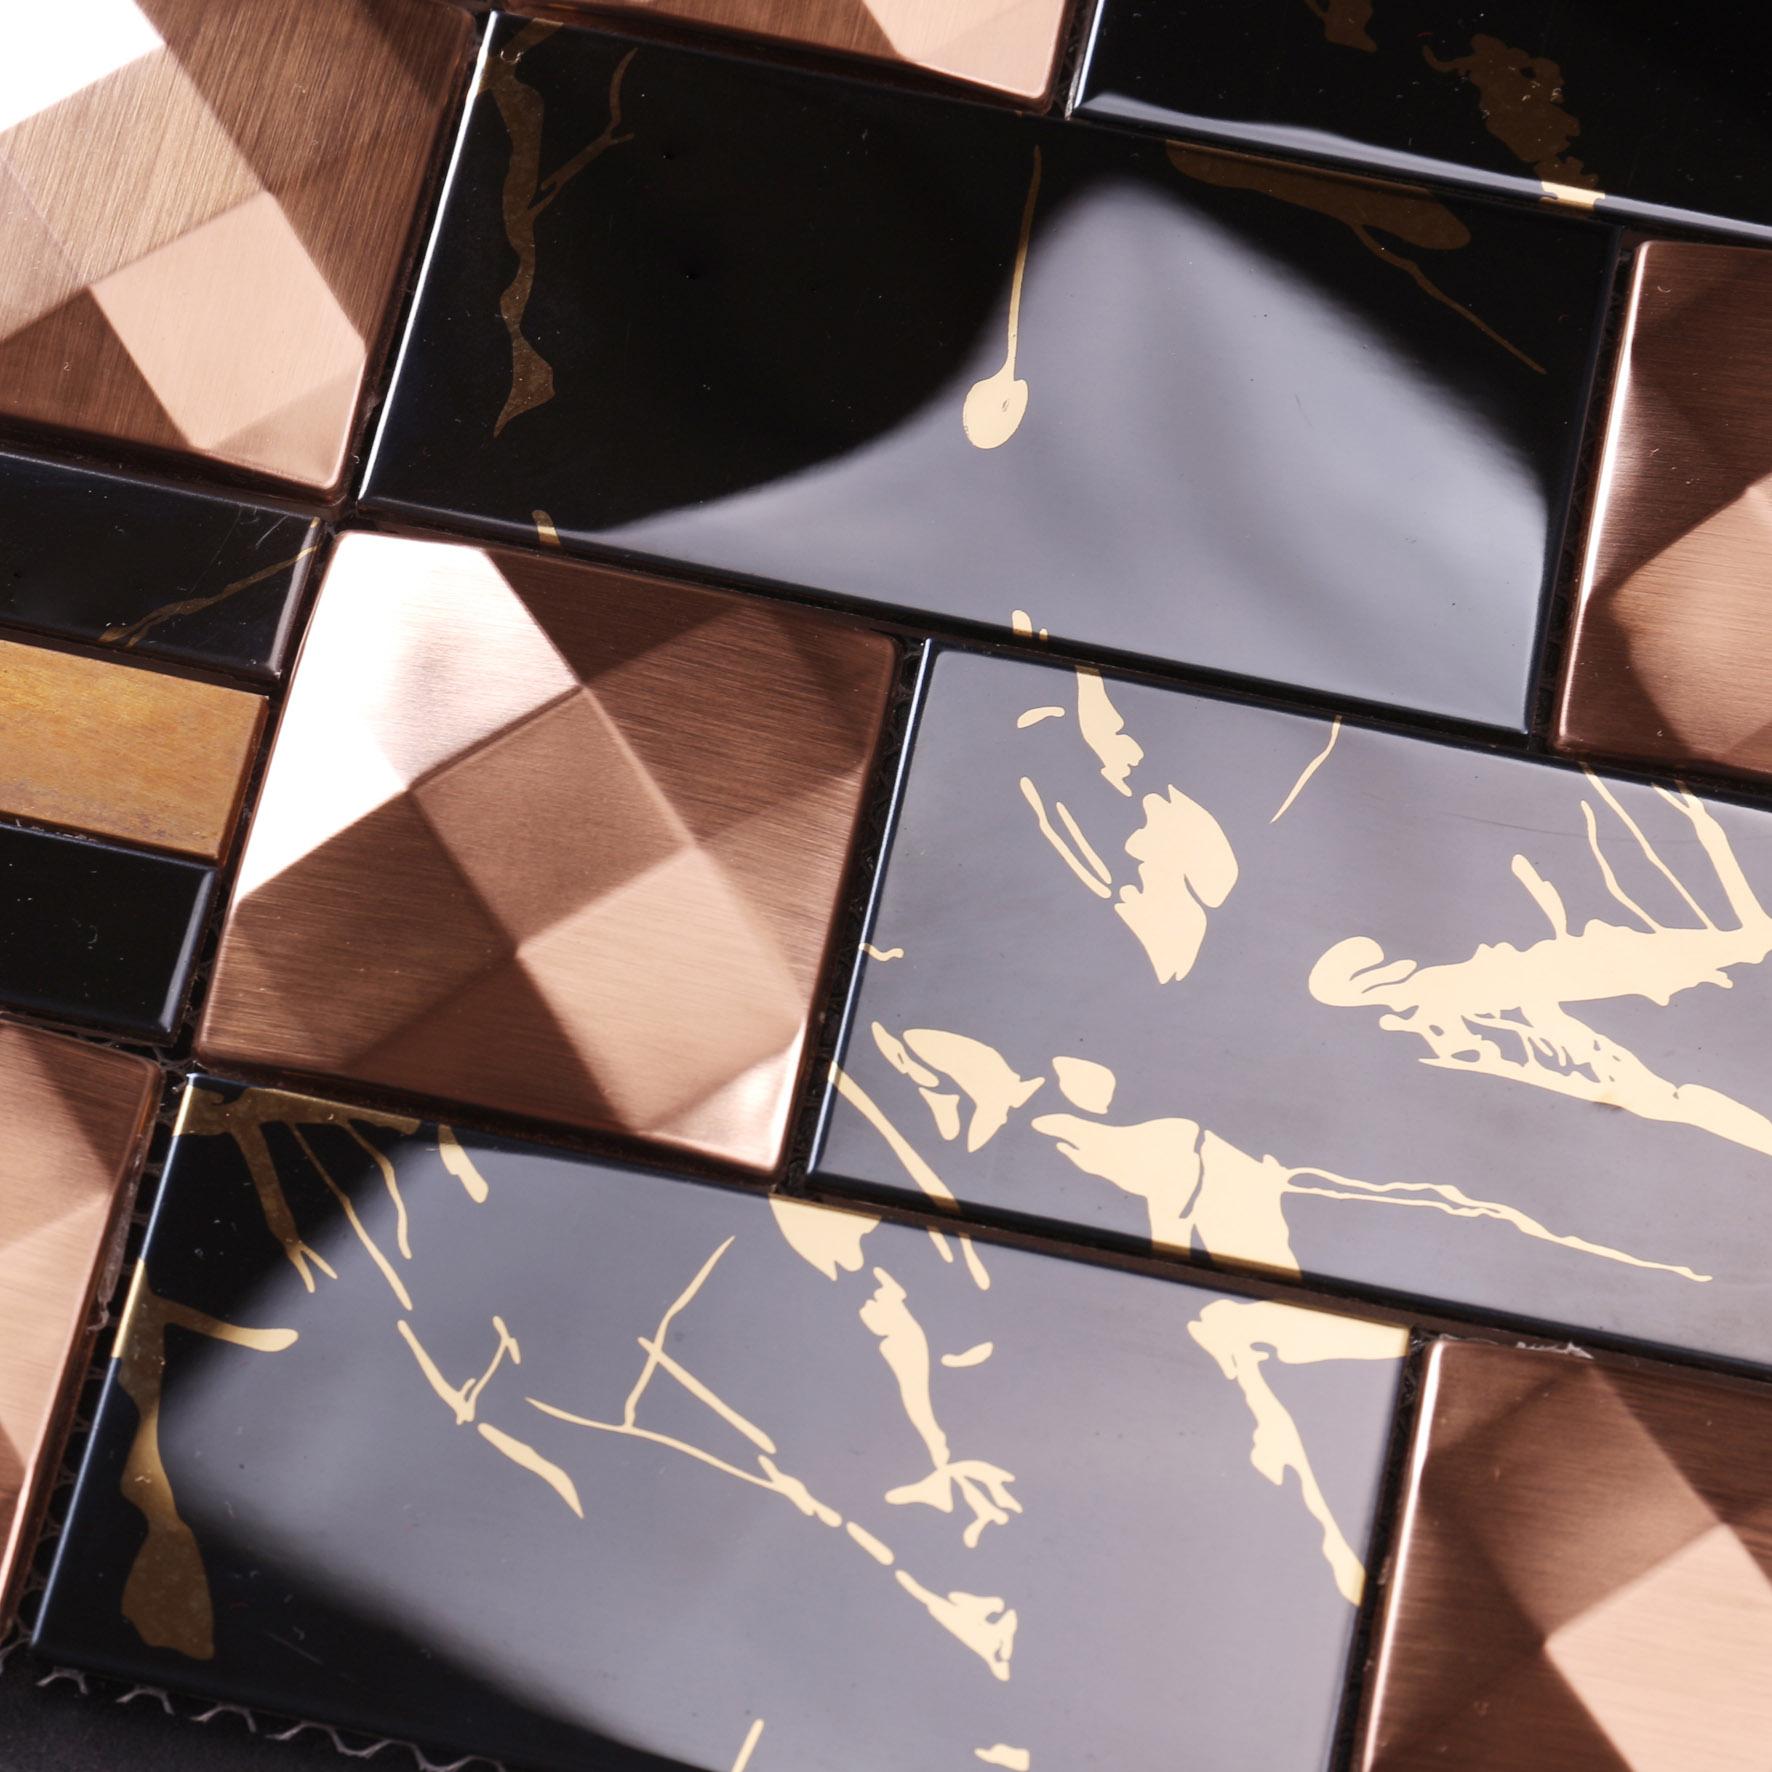 news-Heng Xing-Heng Xing cube metal mosaic tile series for bathroom-img